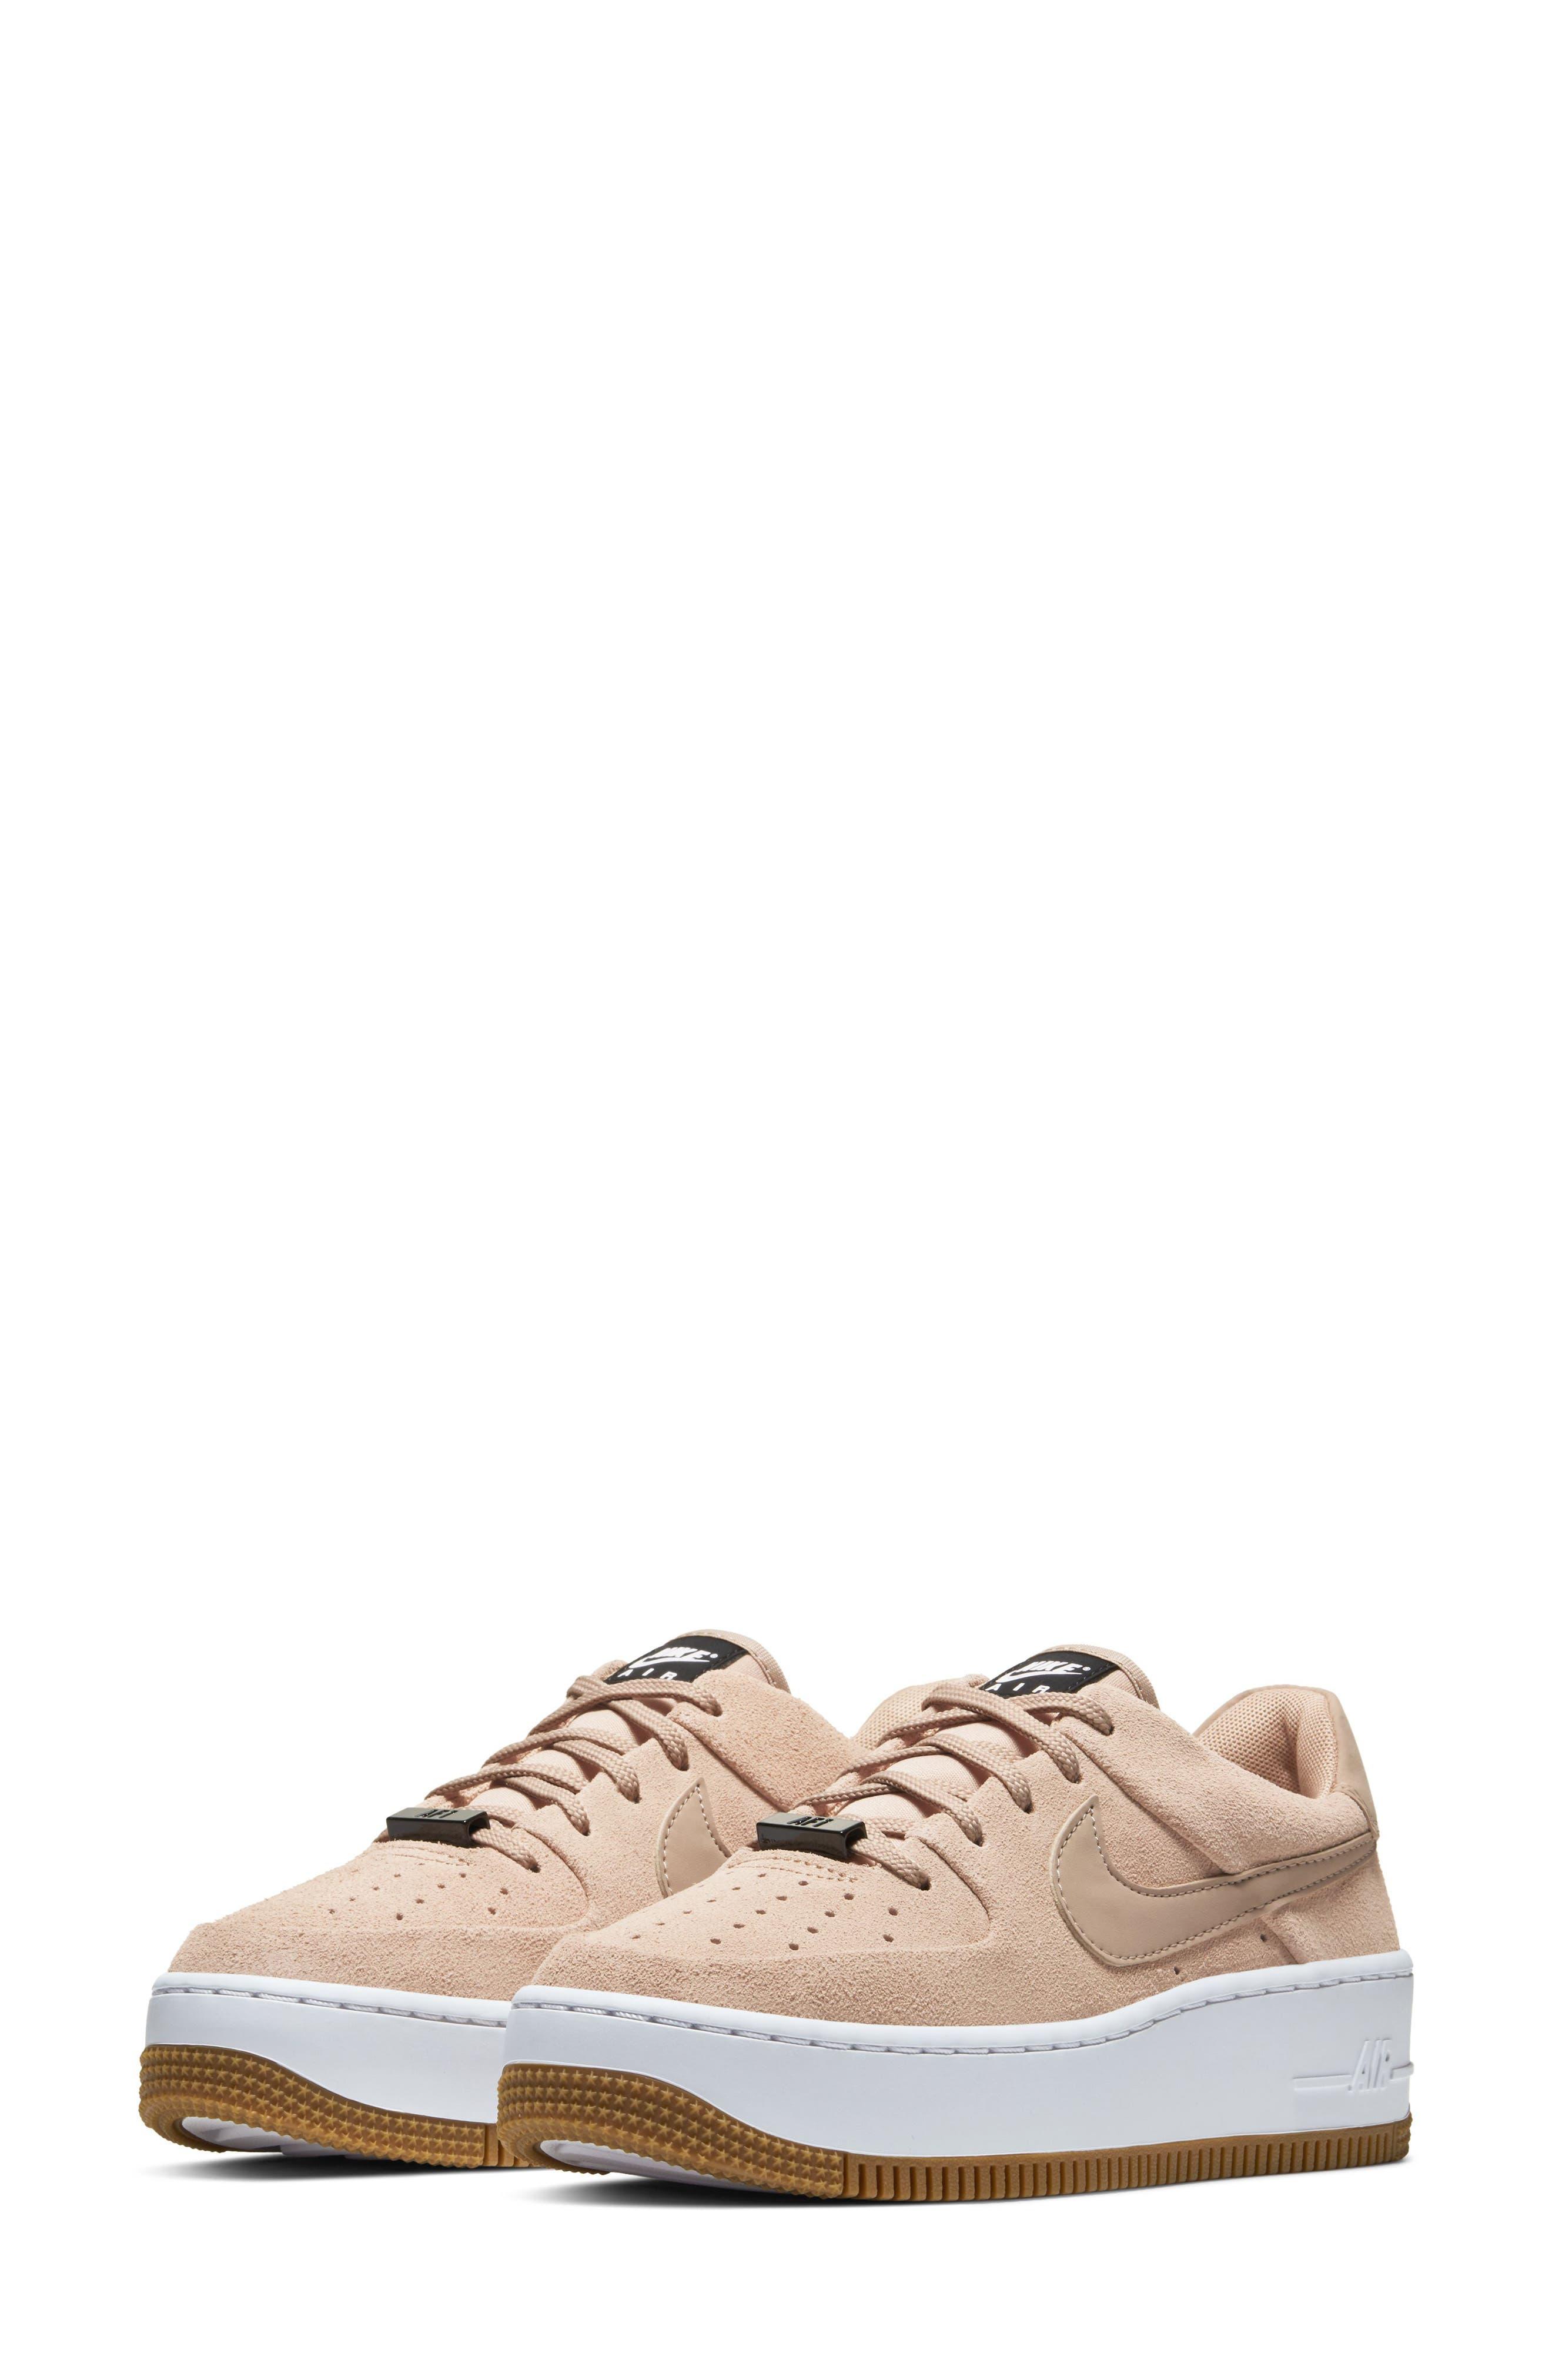 Nike | Air Force 1 Sage Low Top White